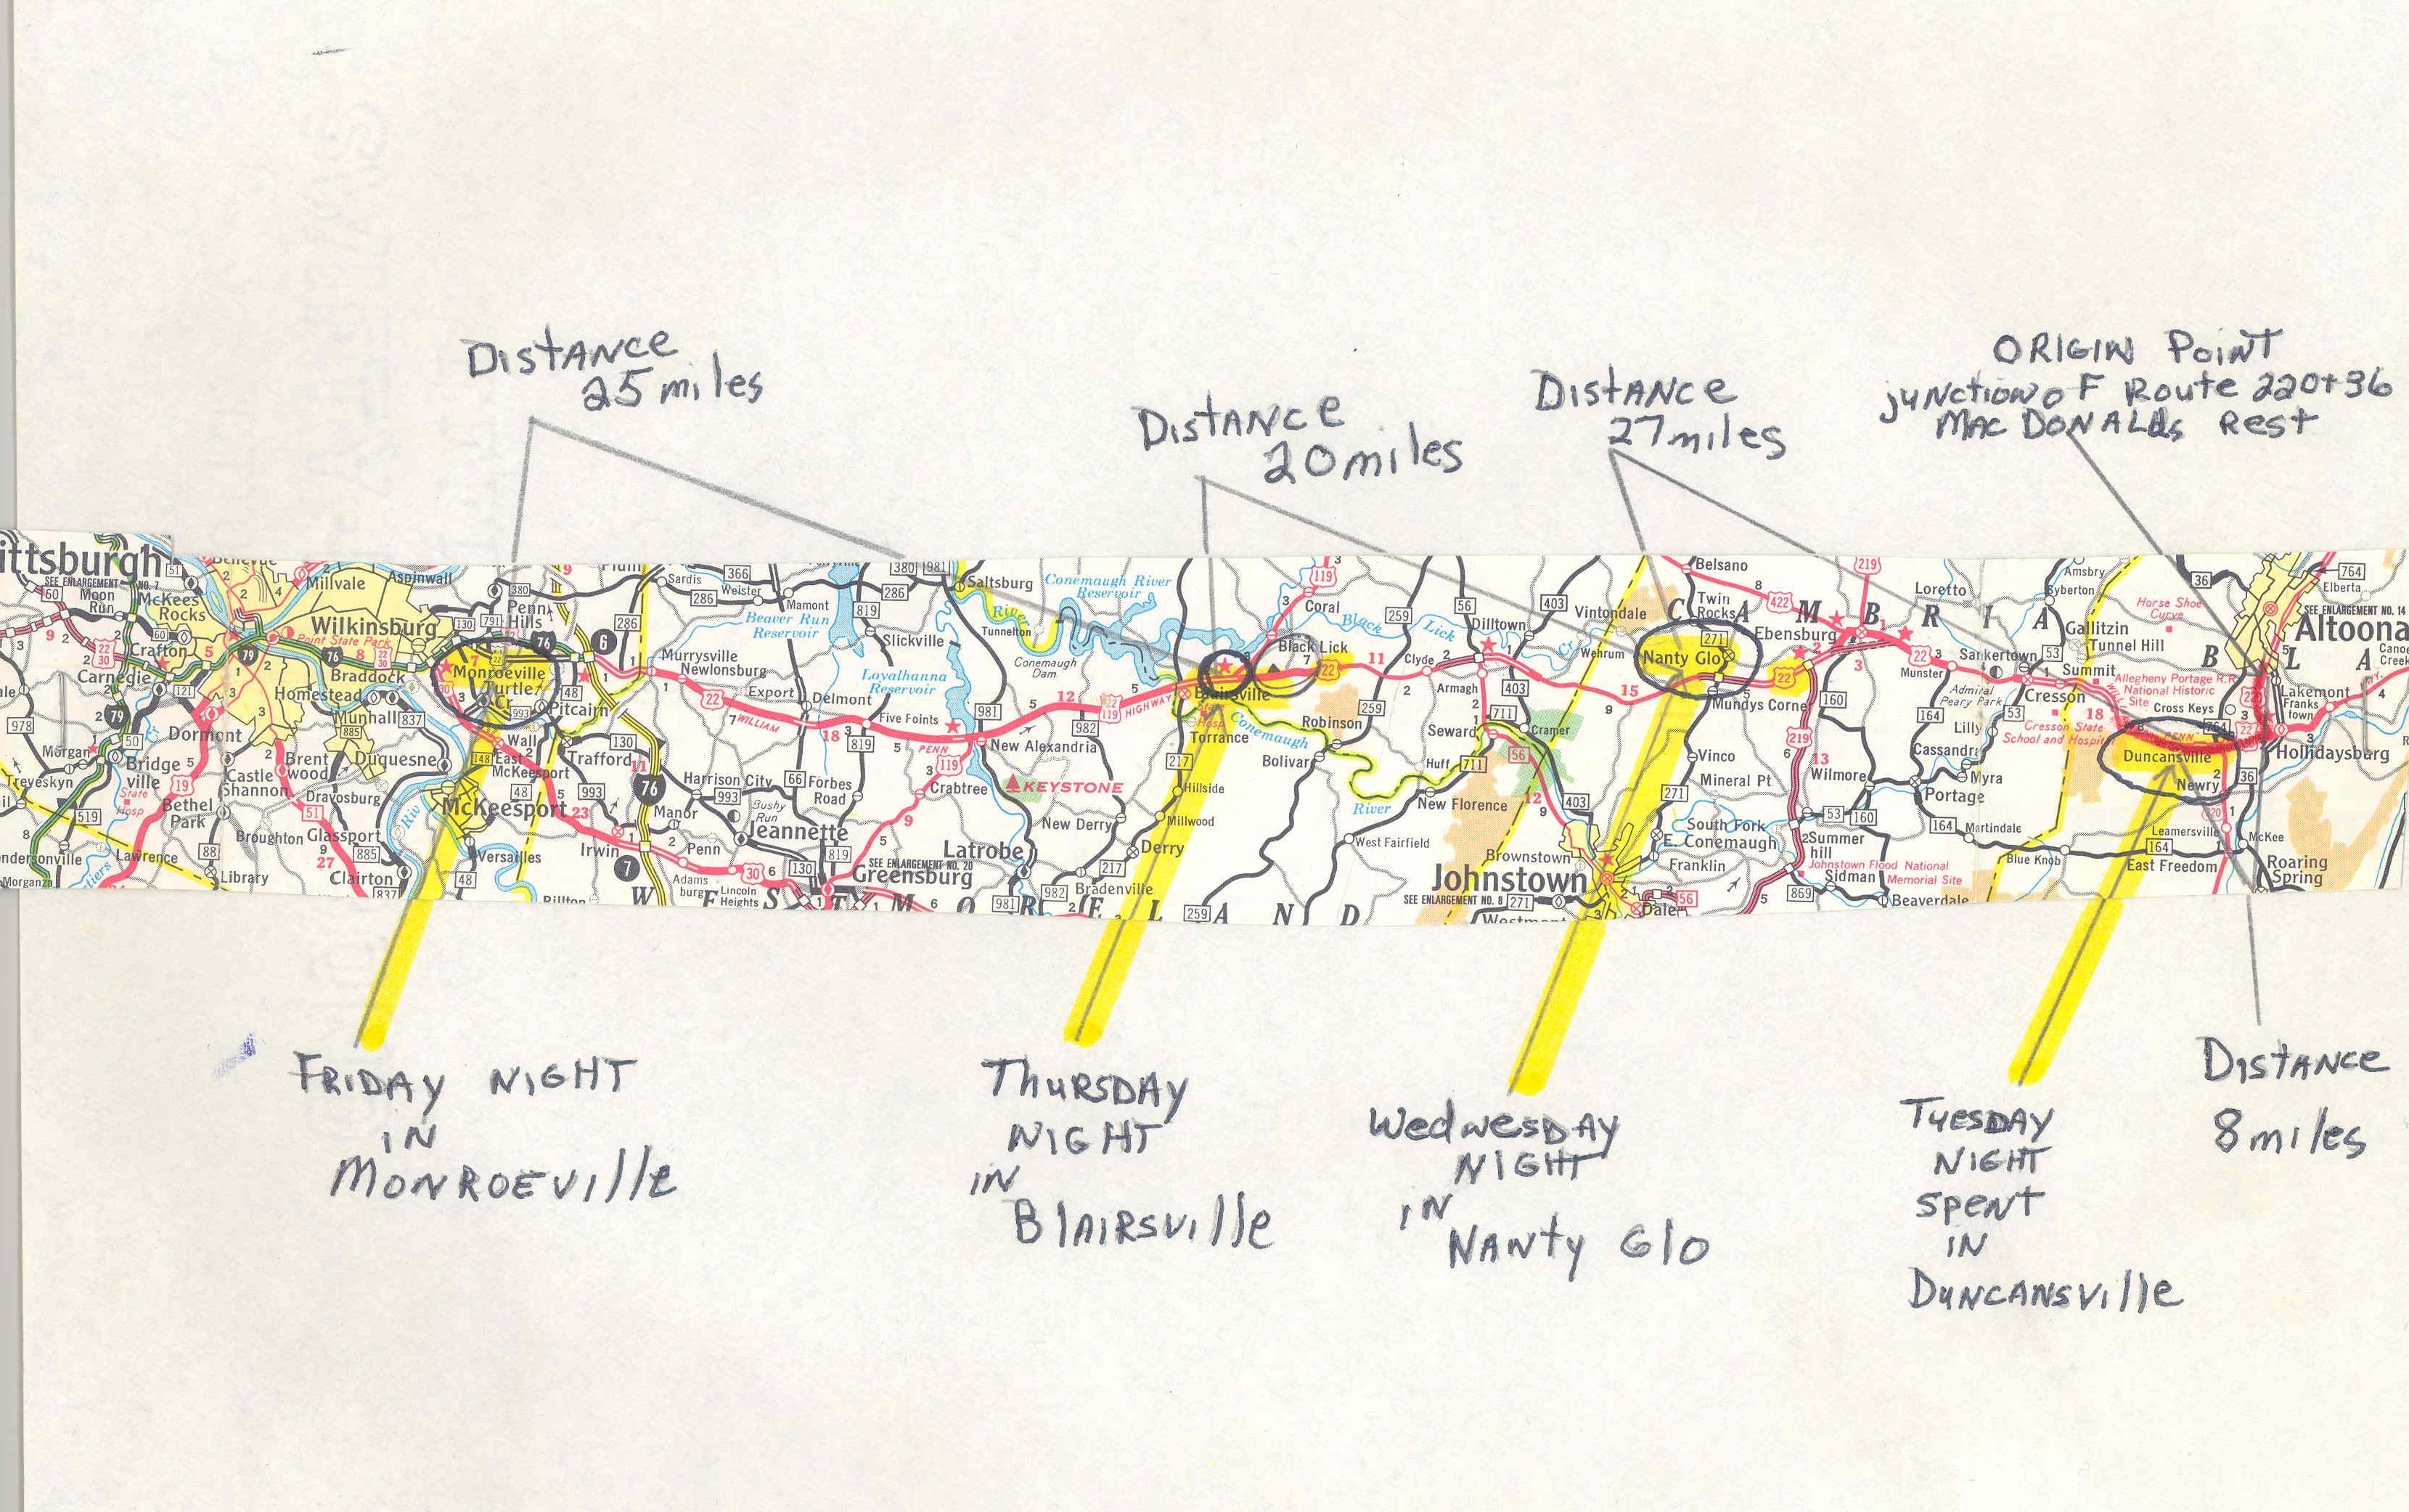 Maps Duquesne University Map on